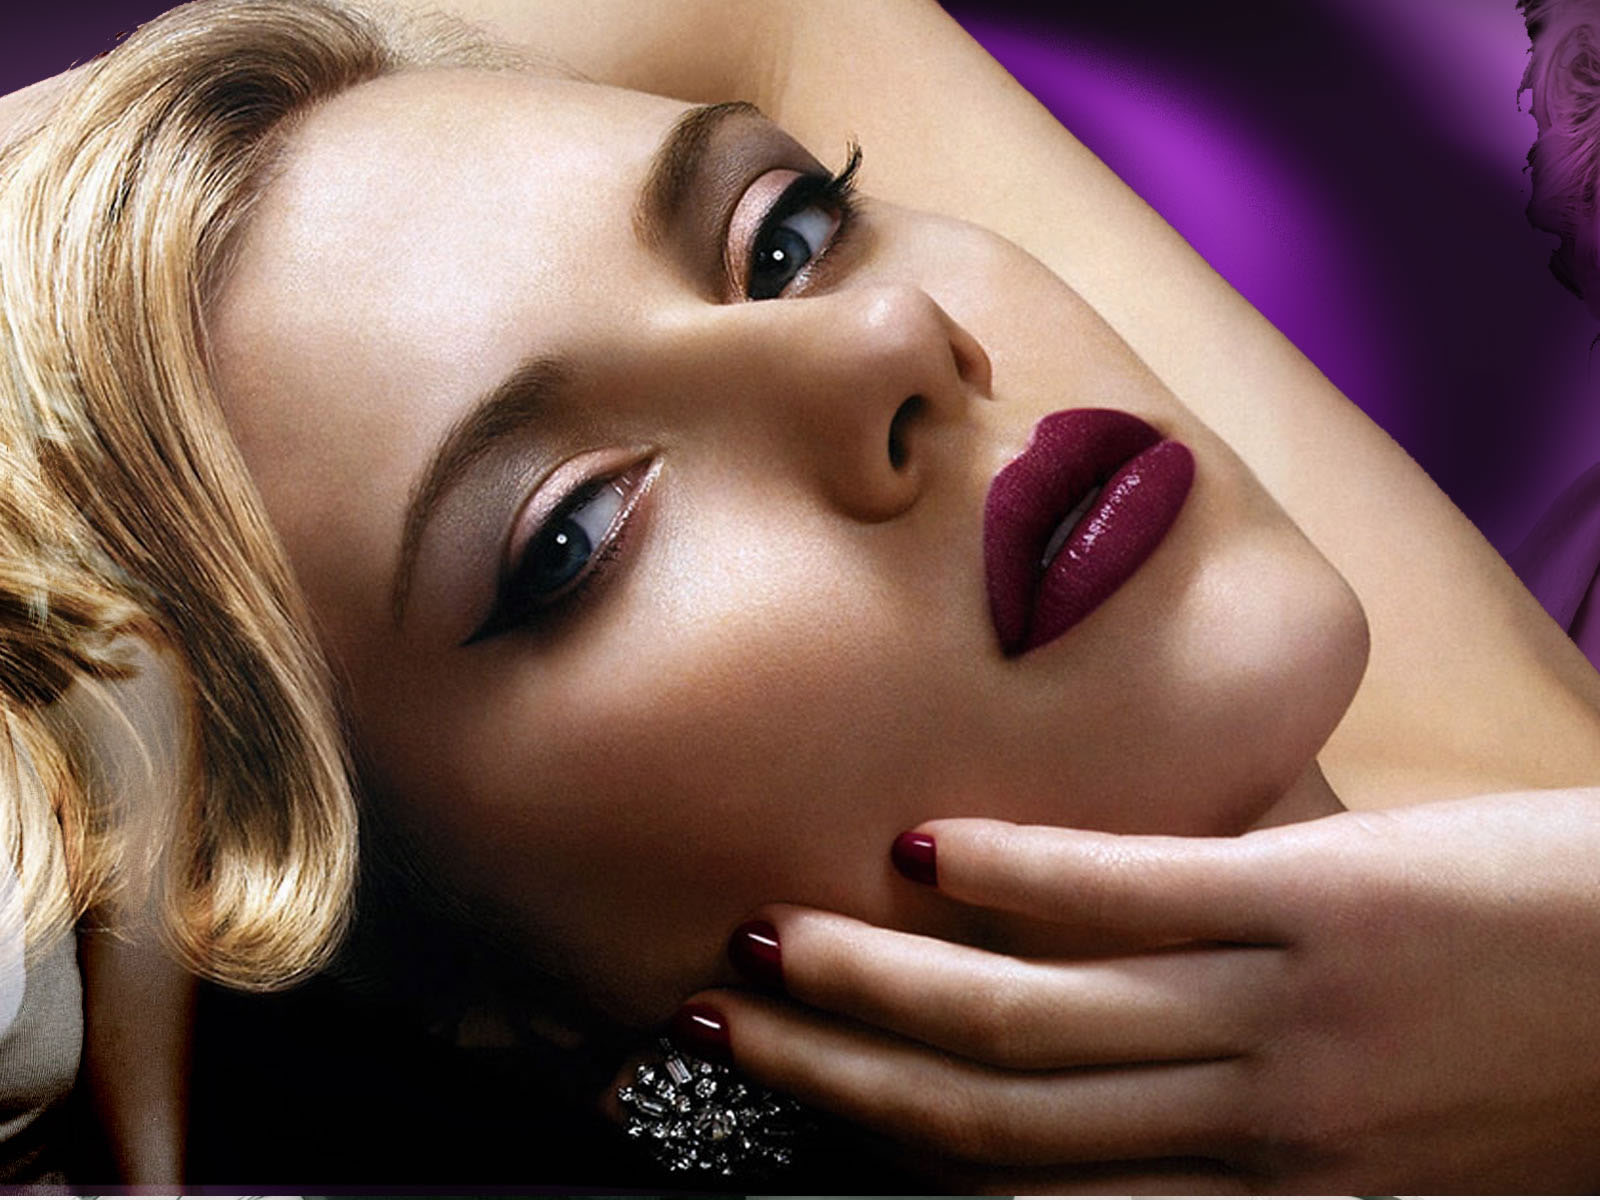 Hot Celebrity Photos Scarlett Johansson - Celebrity Hot -8815